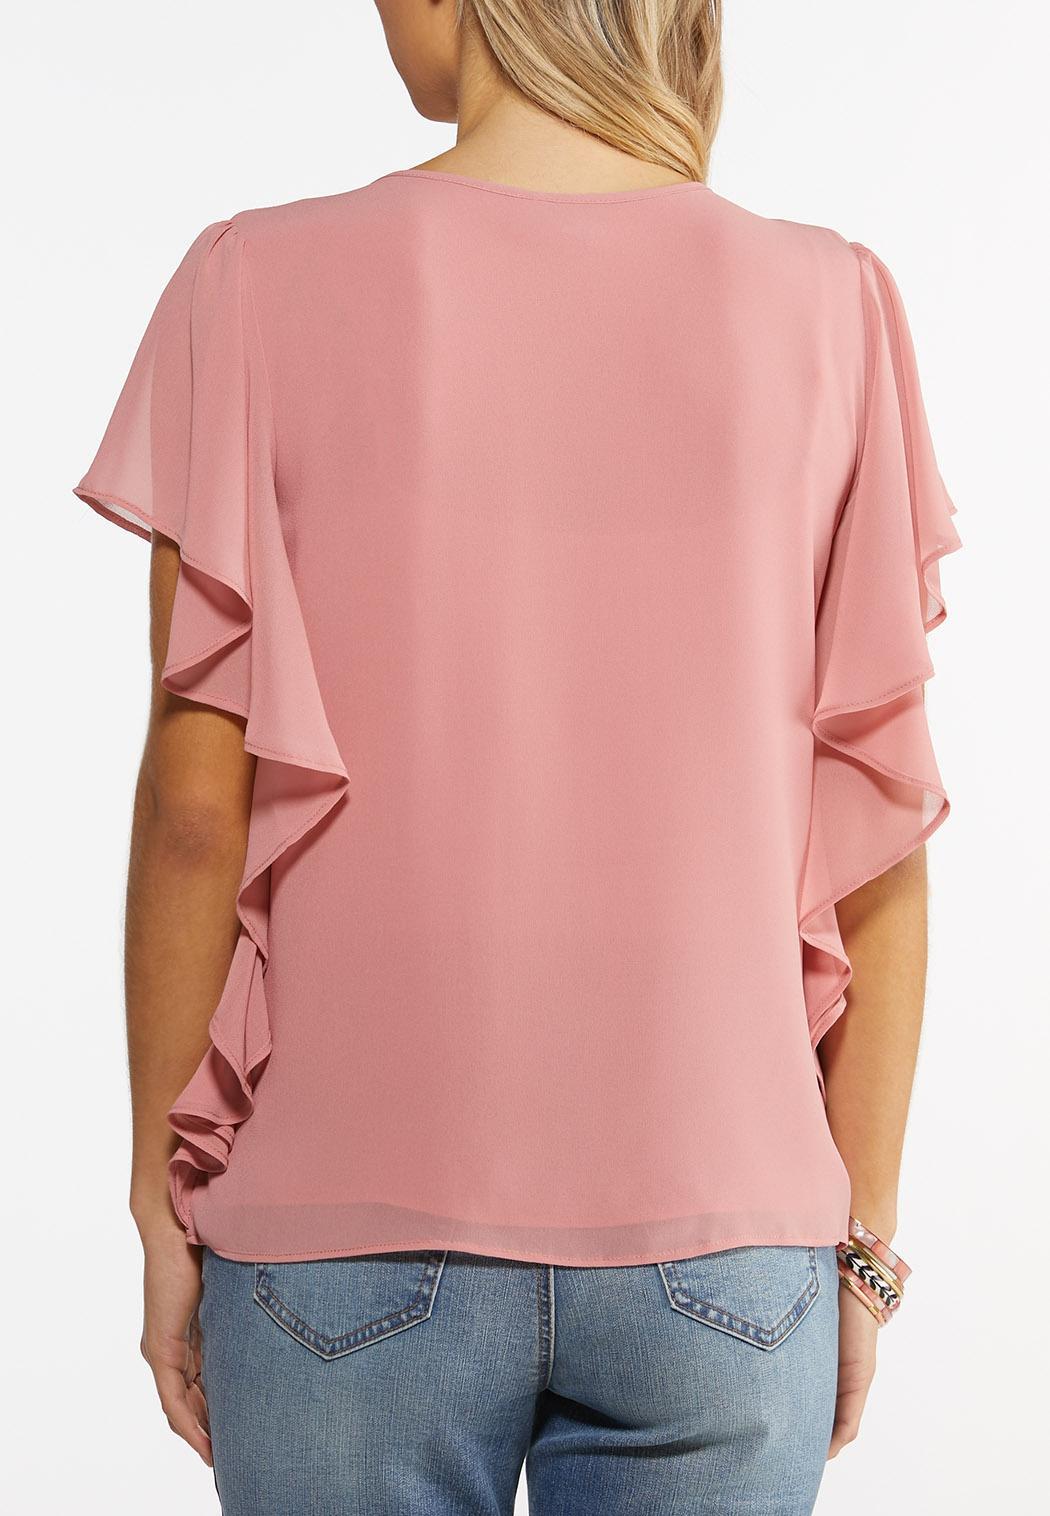 Flutter Sleeve Top (Item #44516618)